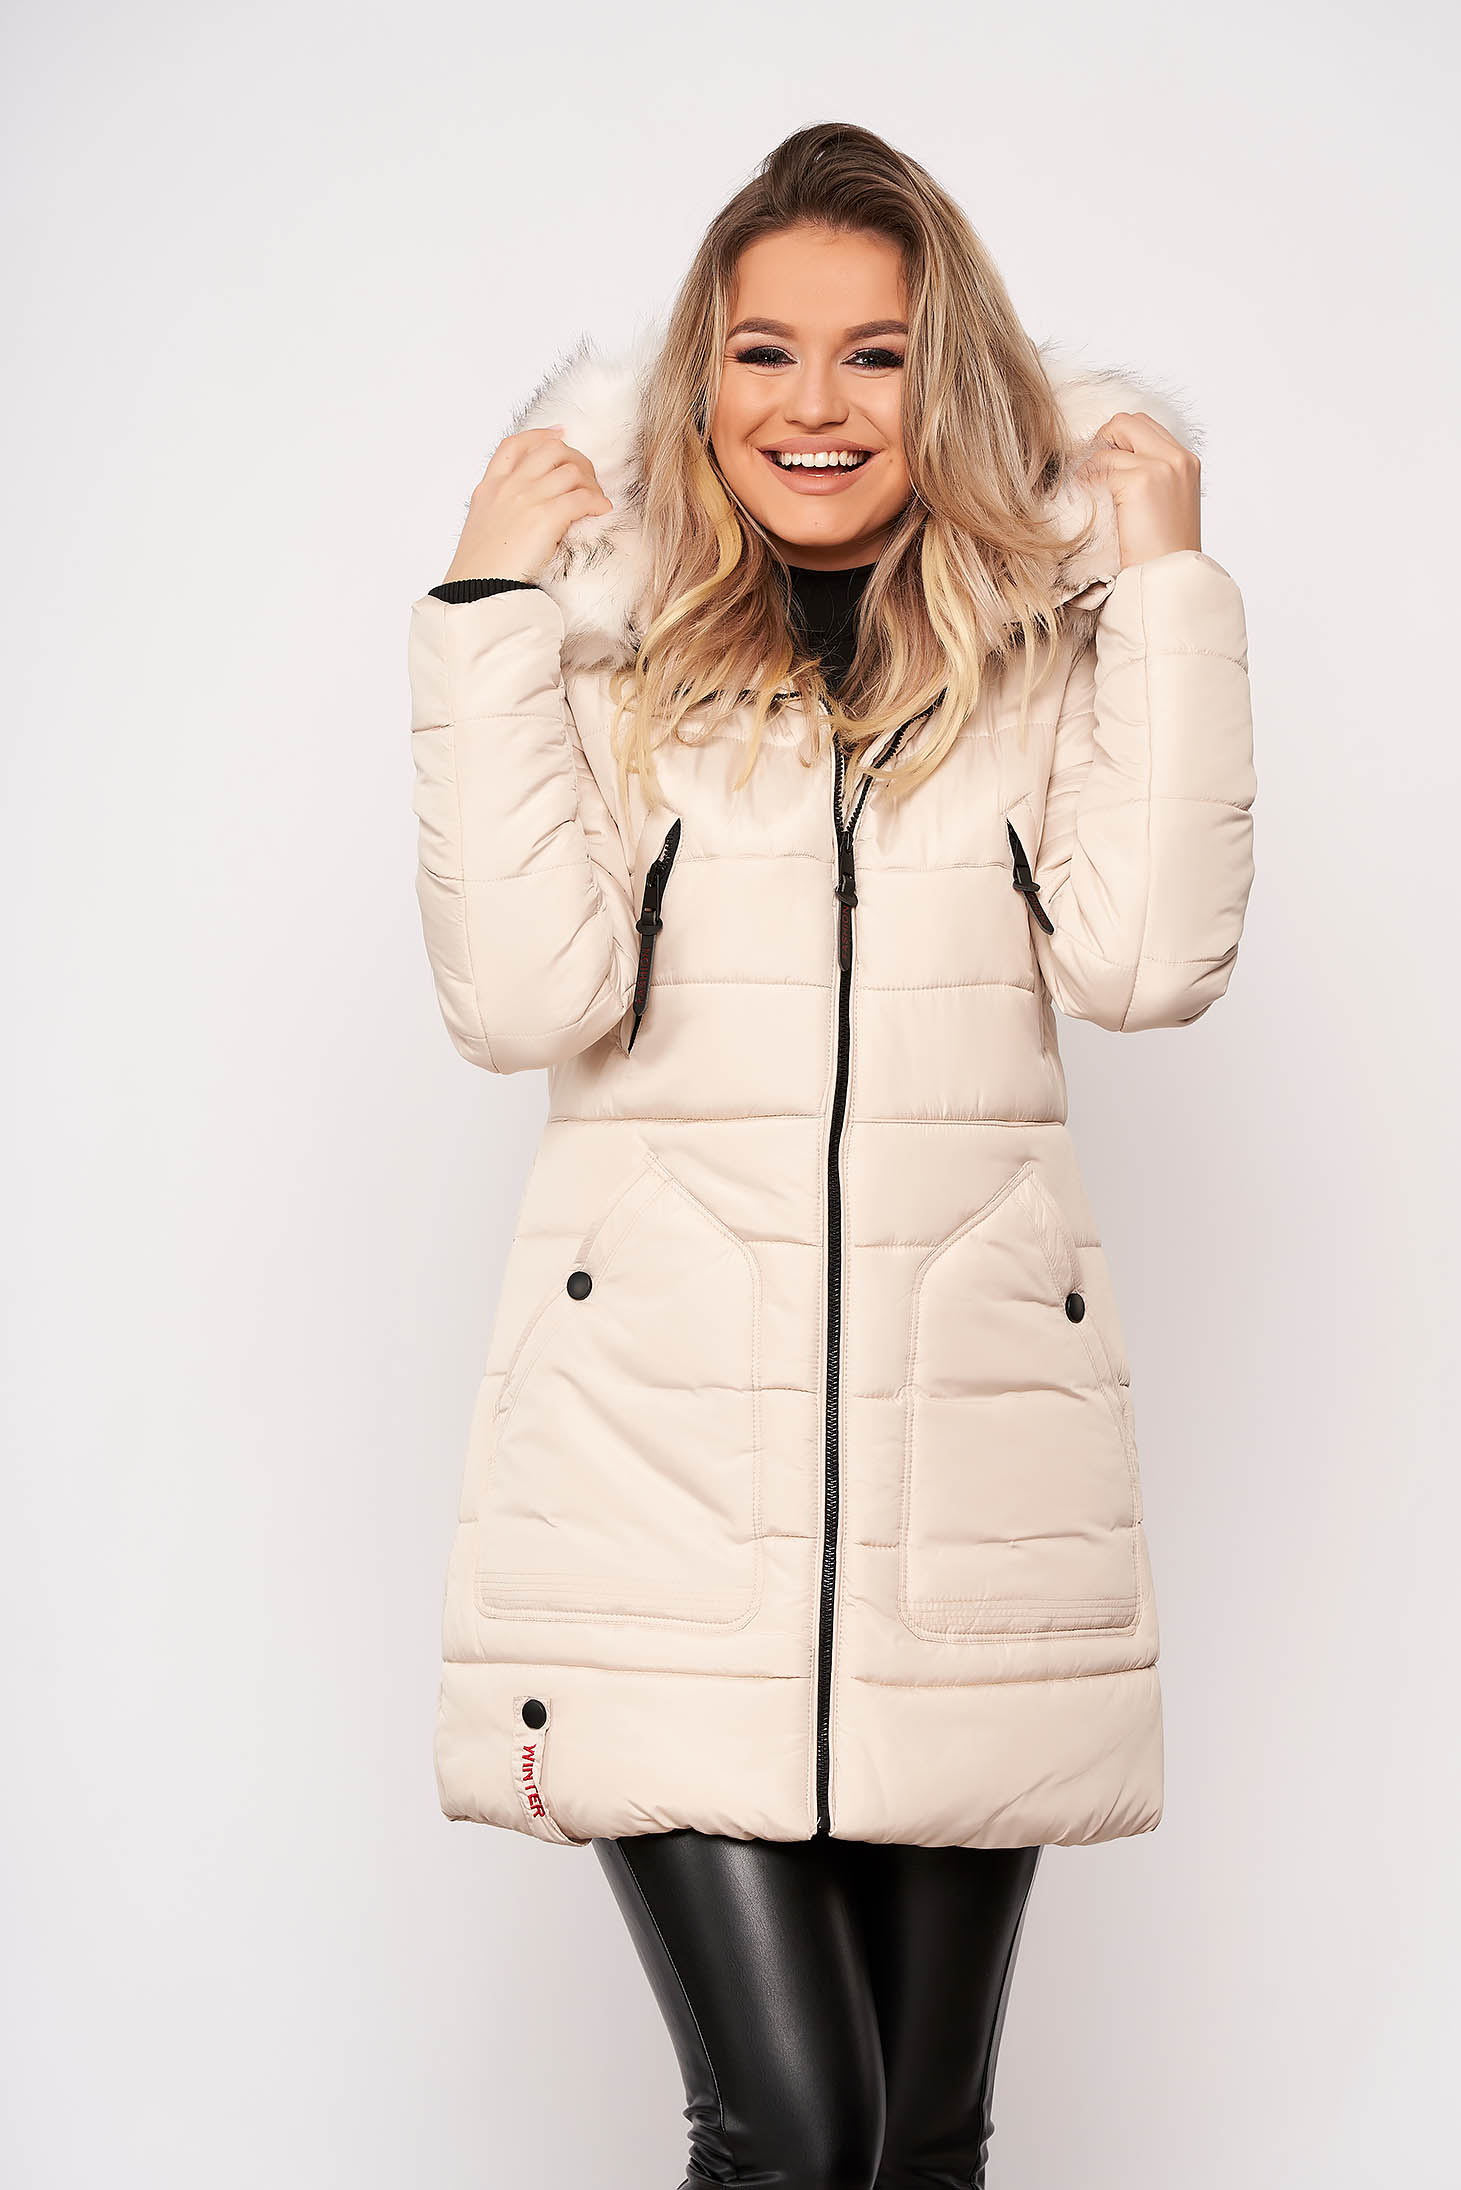 Jacket cream casual midi from slicker with pockets detachable hood with furry hood long sleeve